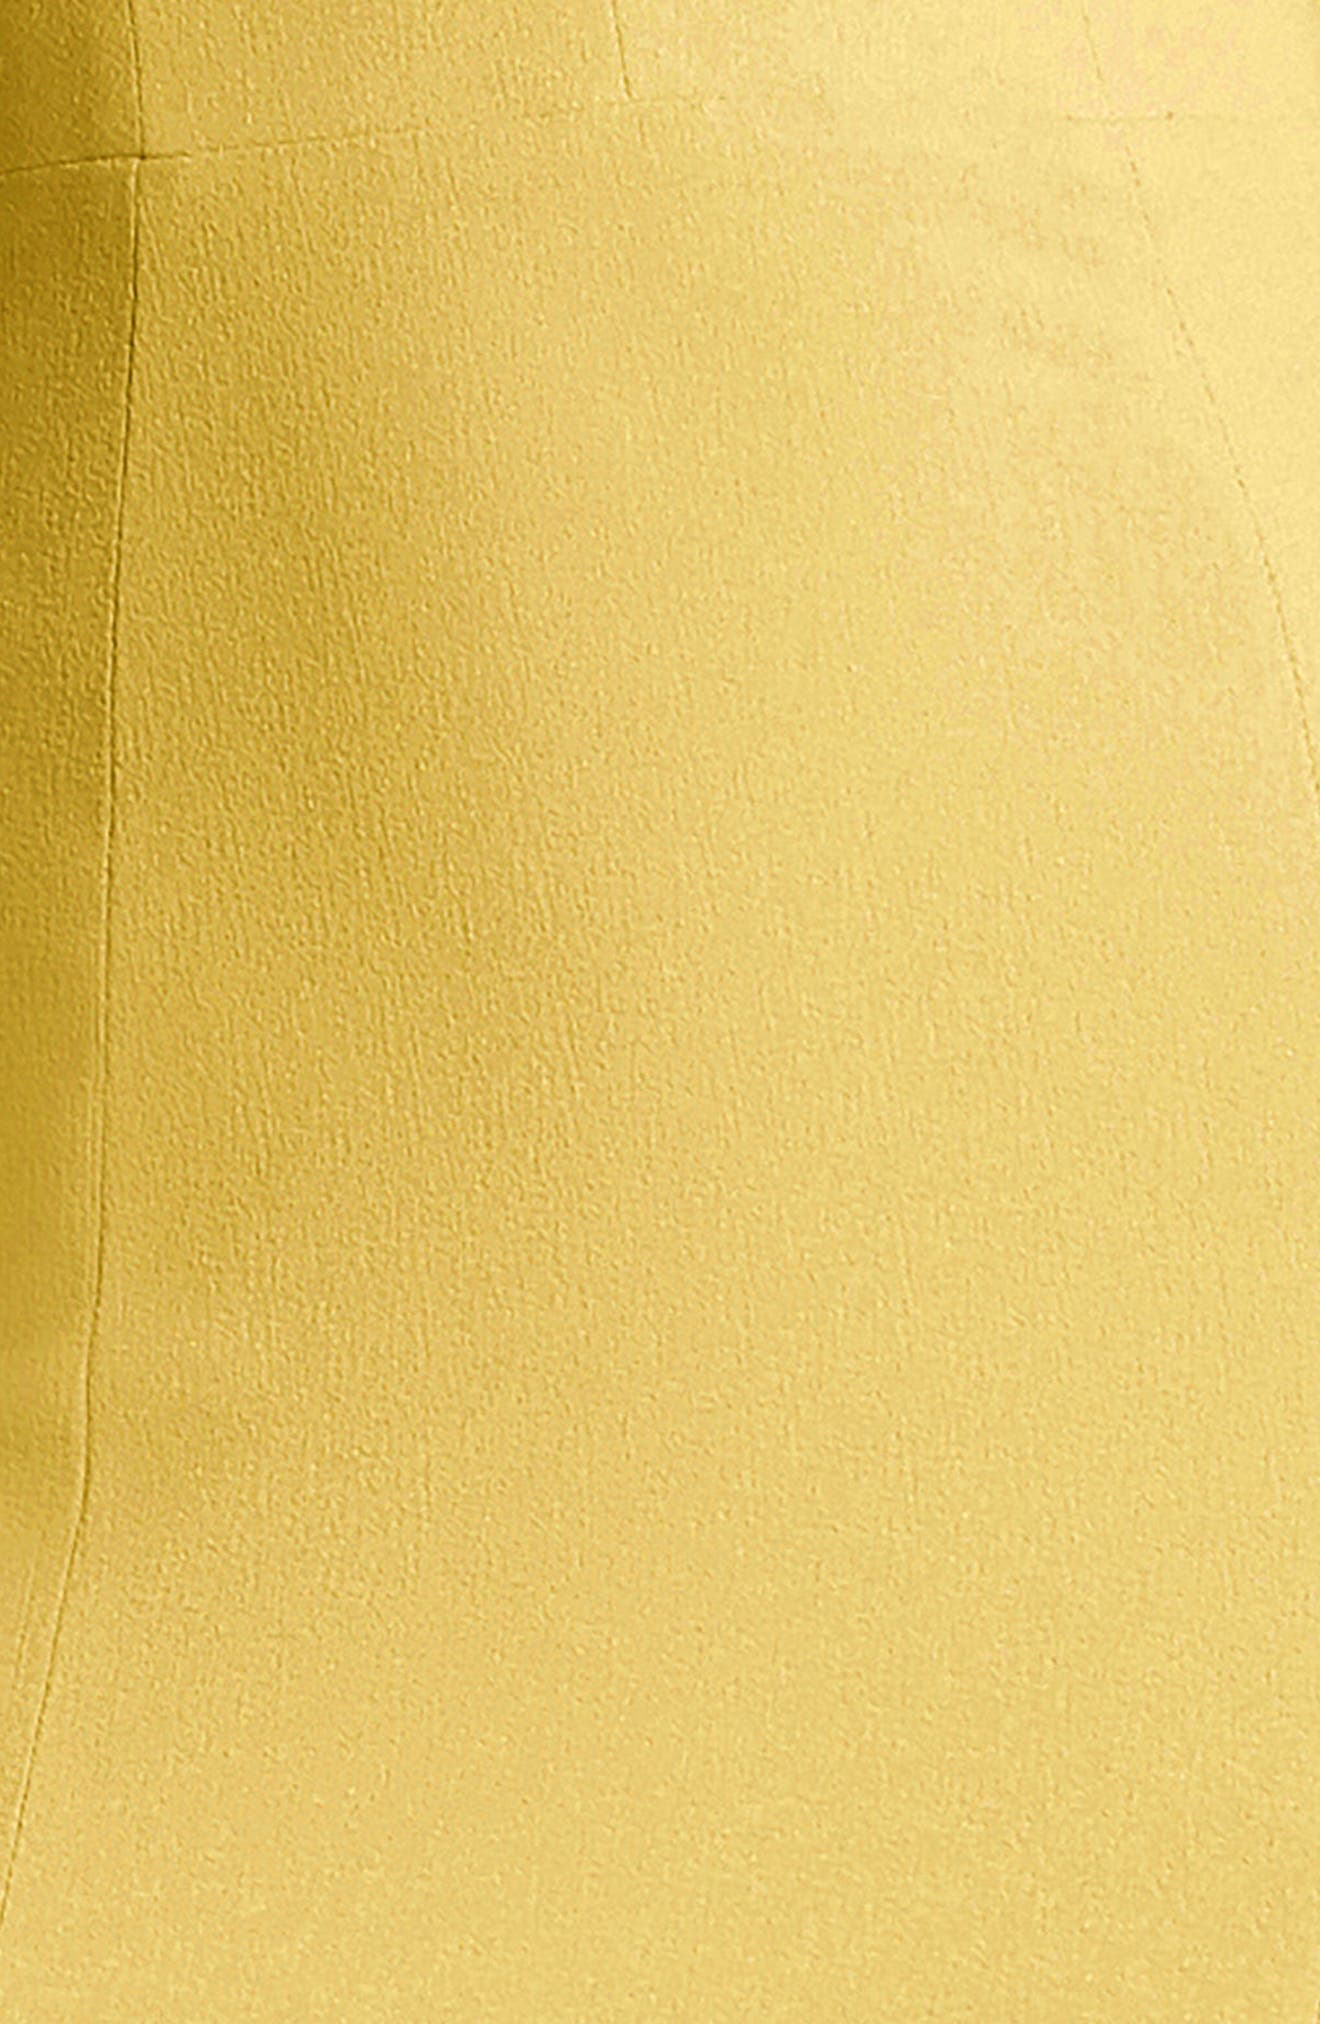 Iris Slit Crepe Gown,                             Alternate thumbnail 4, color,                             Sunflower